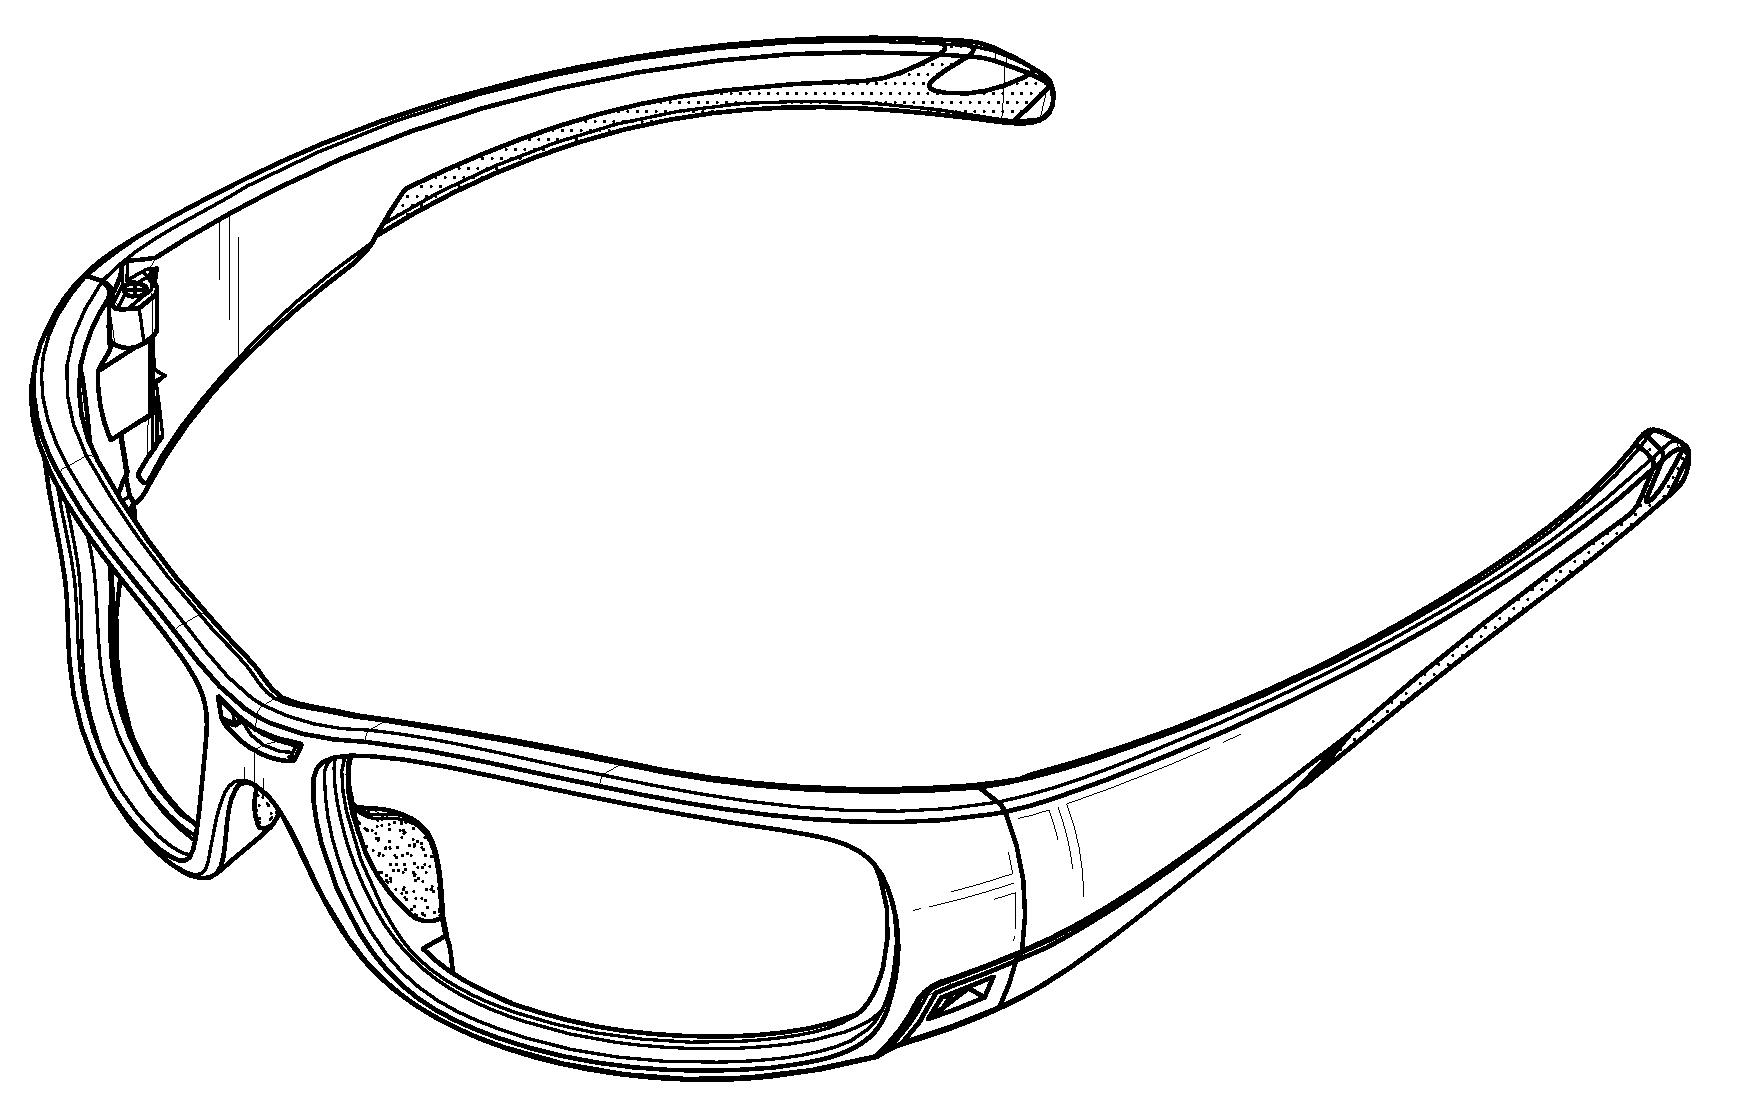 eyeglass frame styles  usd575813 - eyeglass